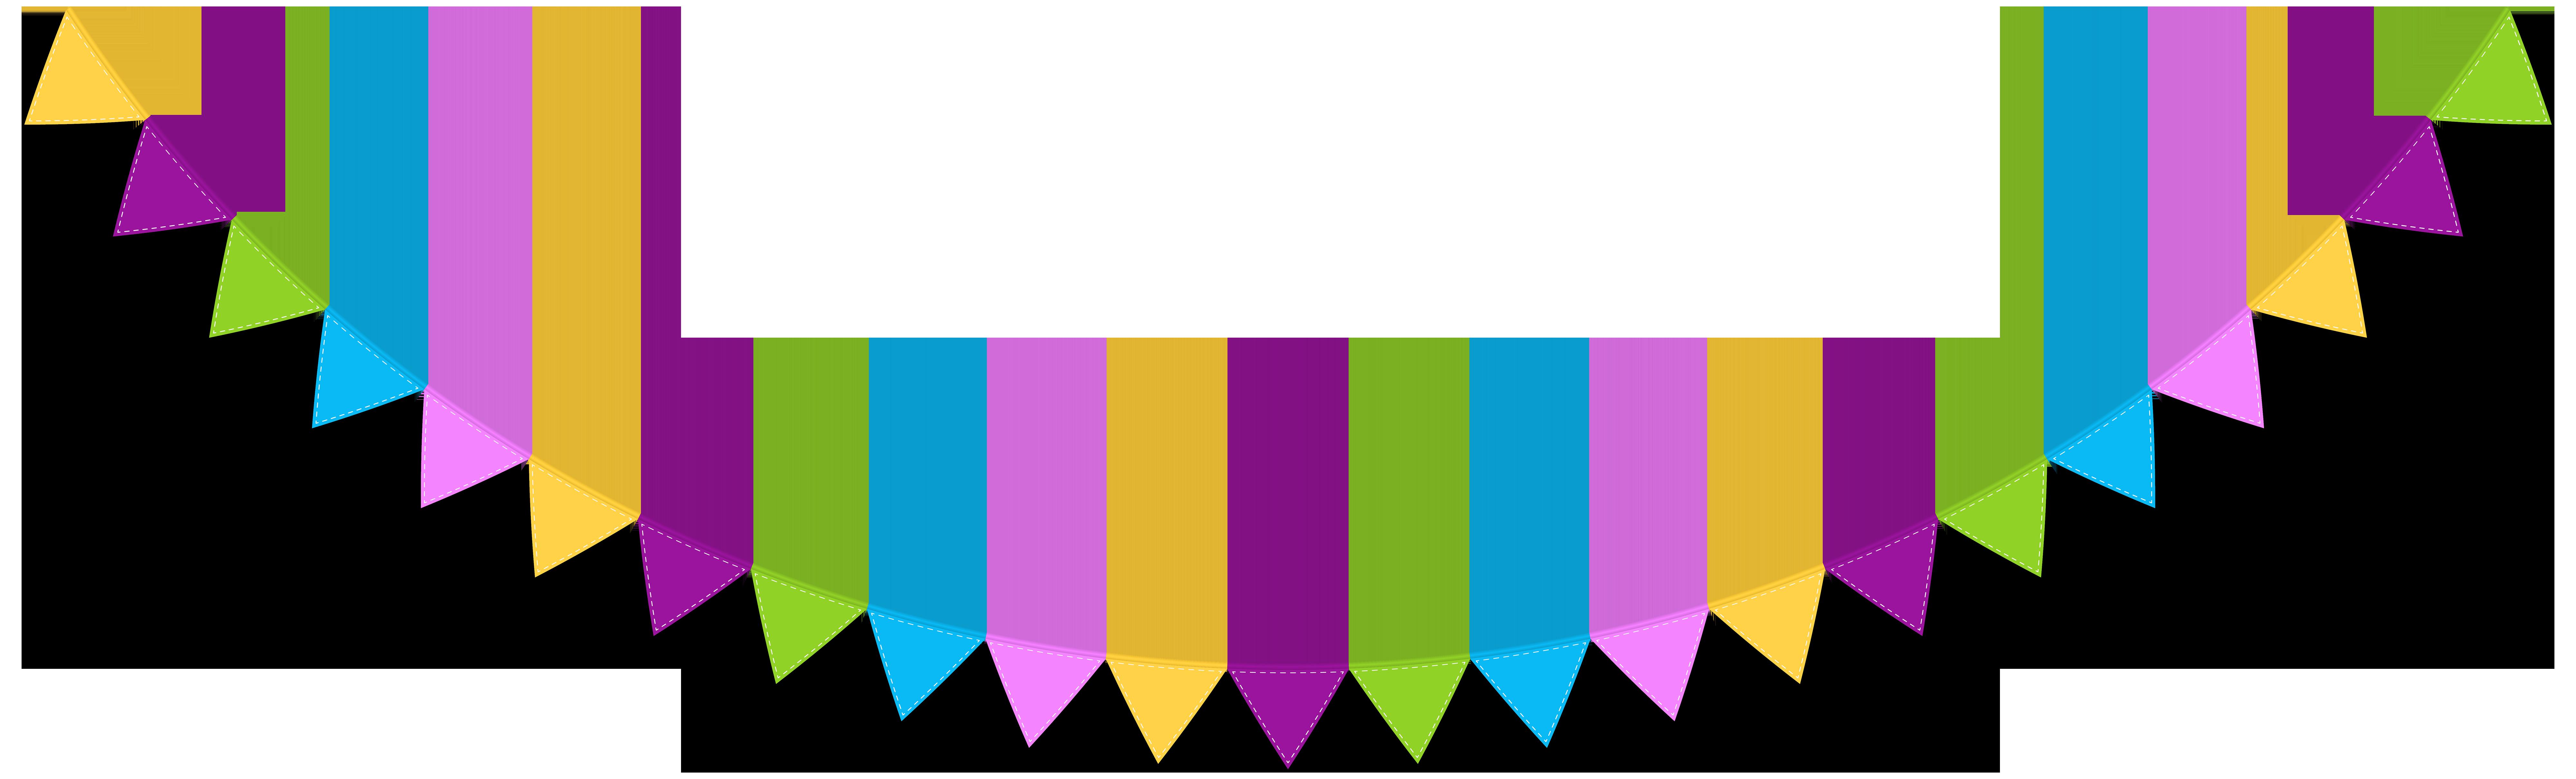 Streamer PNG Clip Art Image.